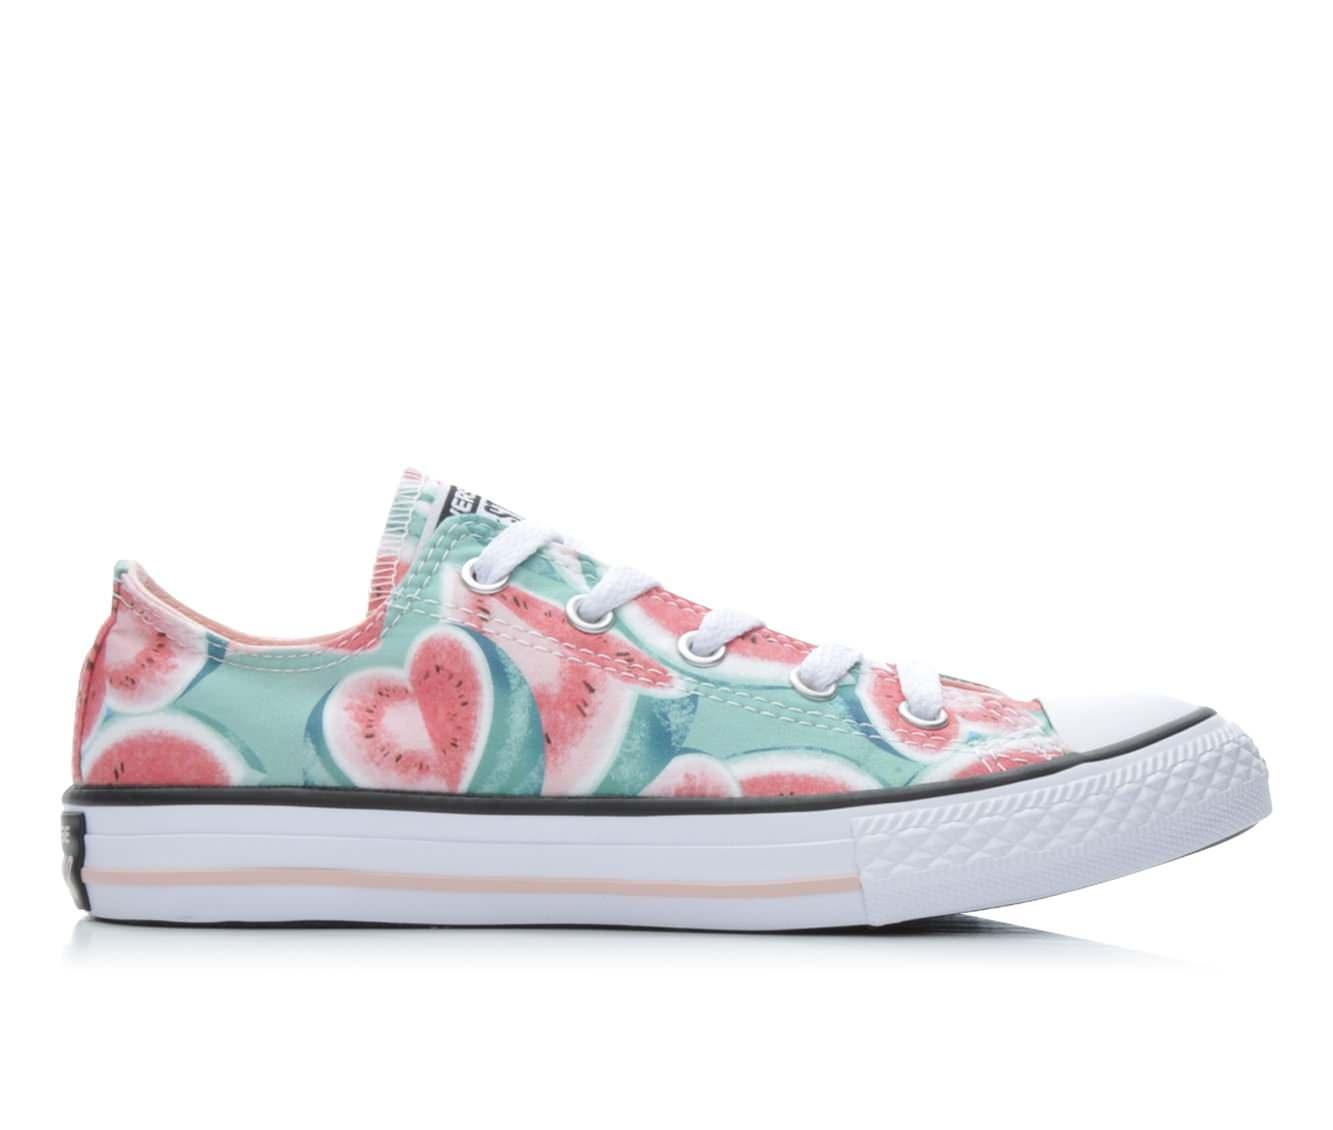 Girls' Converse Chuck Taylor Ox Basketball Shoes (Pink)